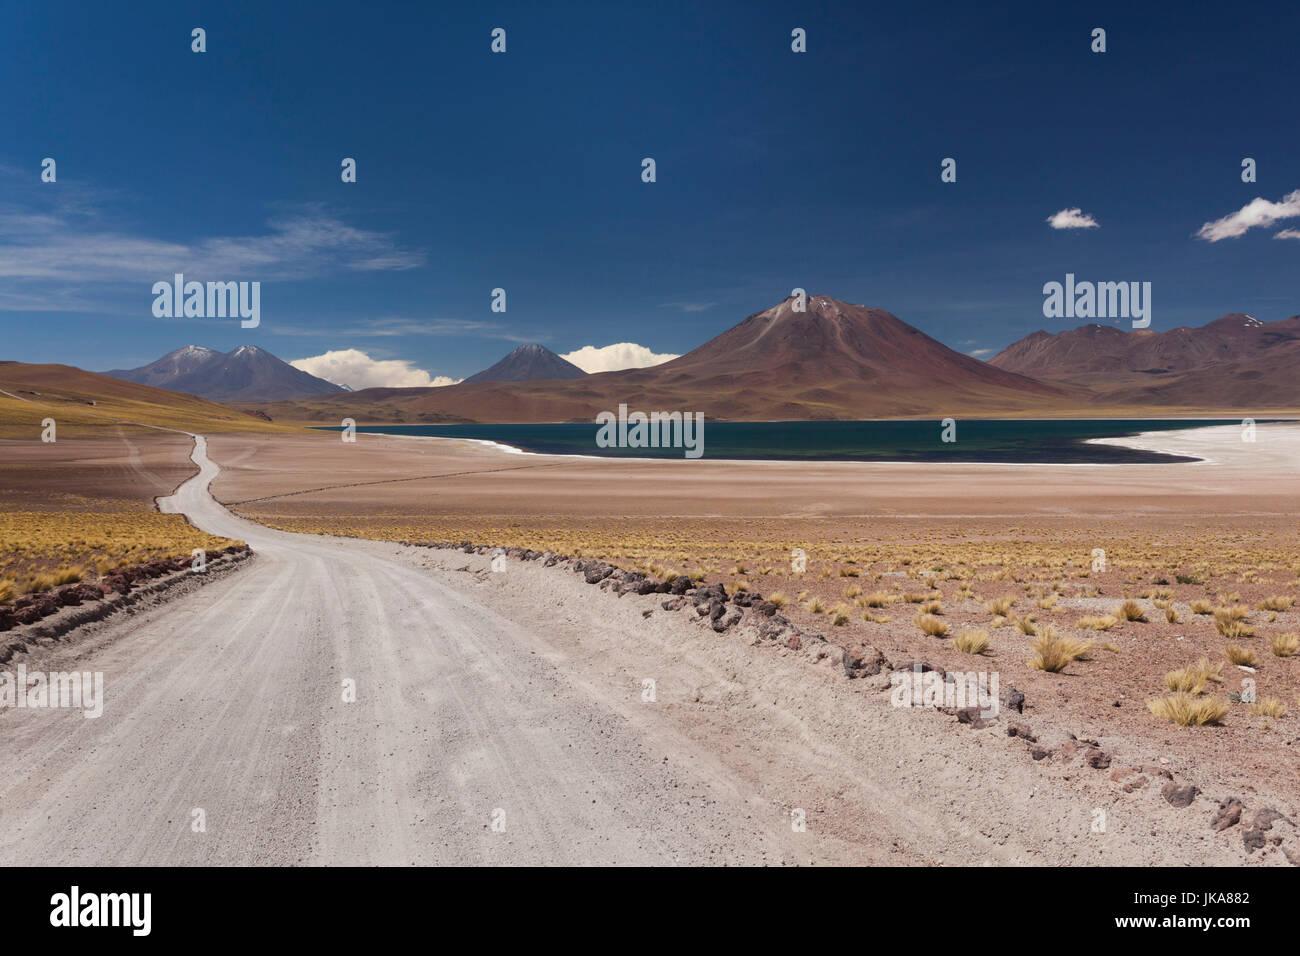 Chile, Atacama Desert, Laguna Miscanti, desert road - Stock Image